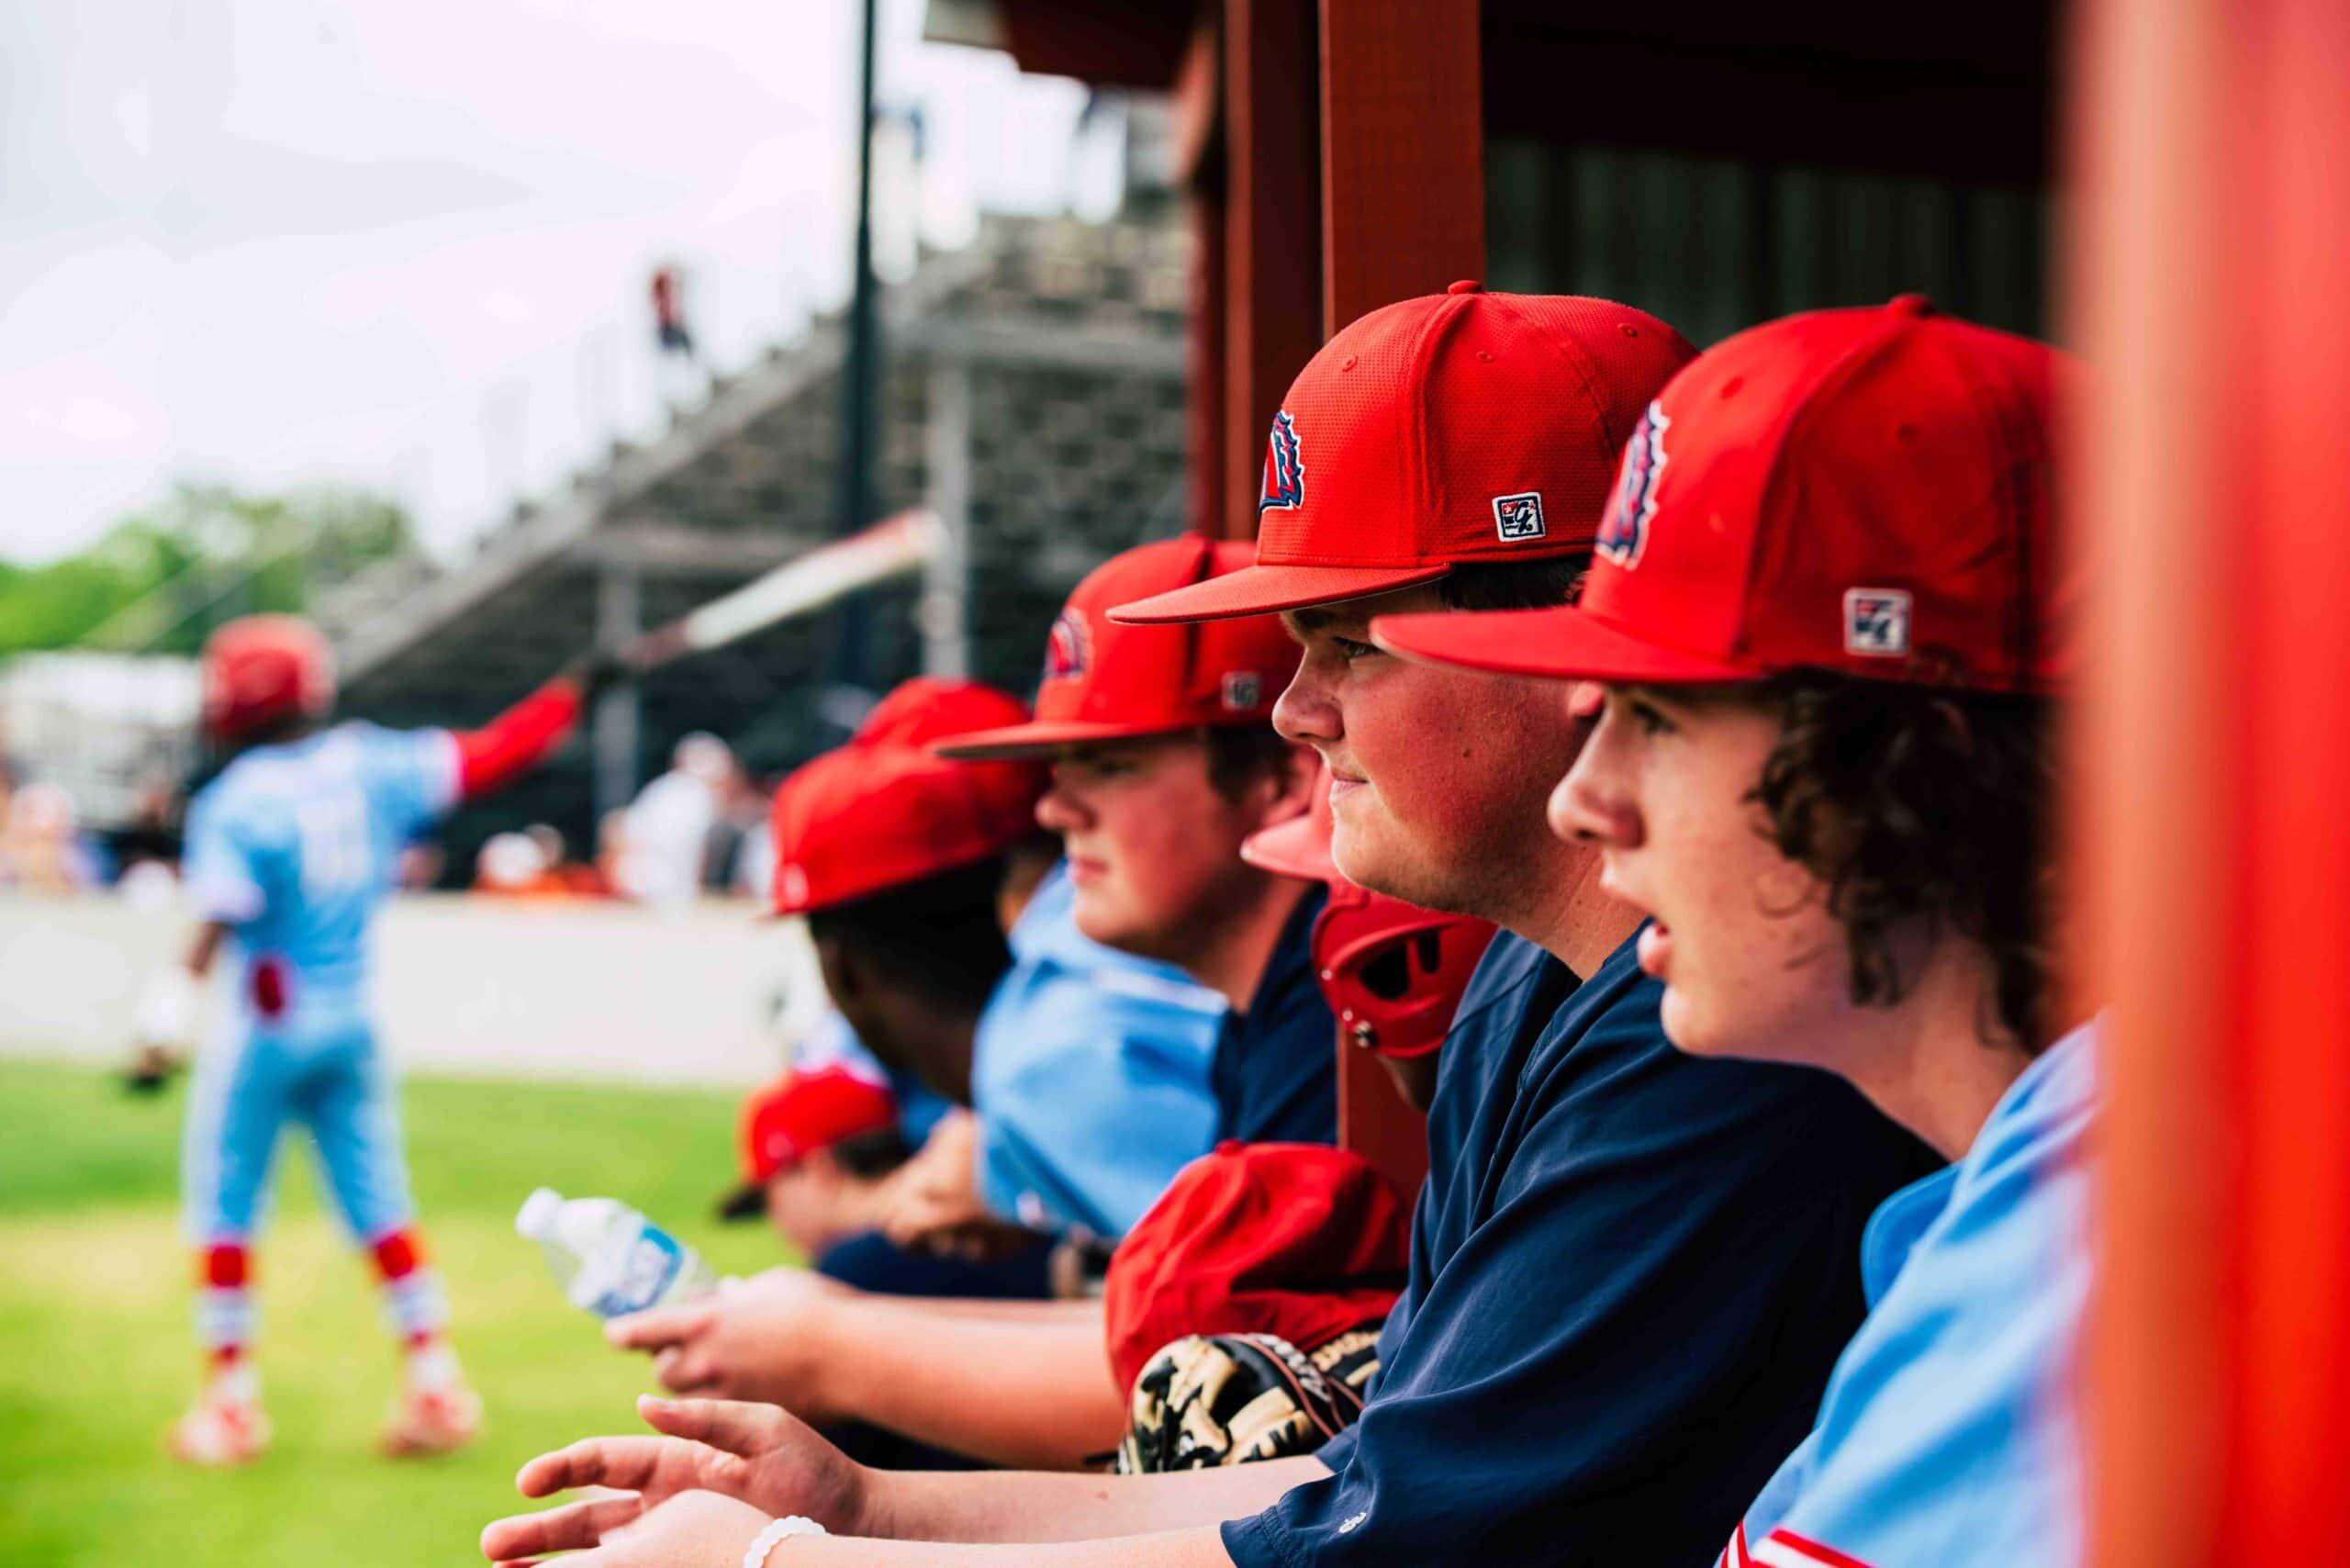 Baseball players watch game